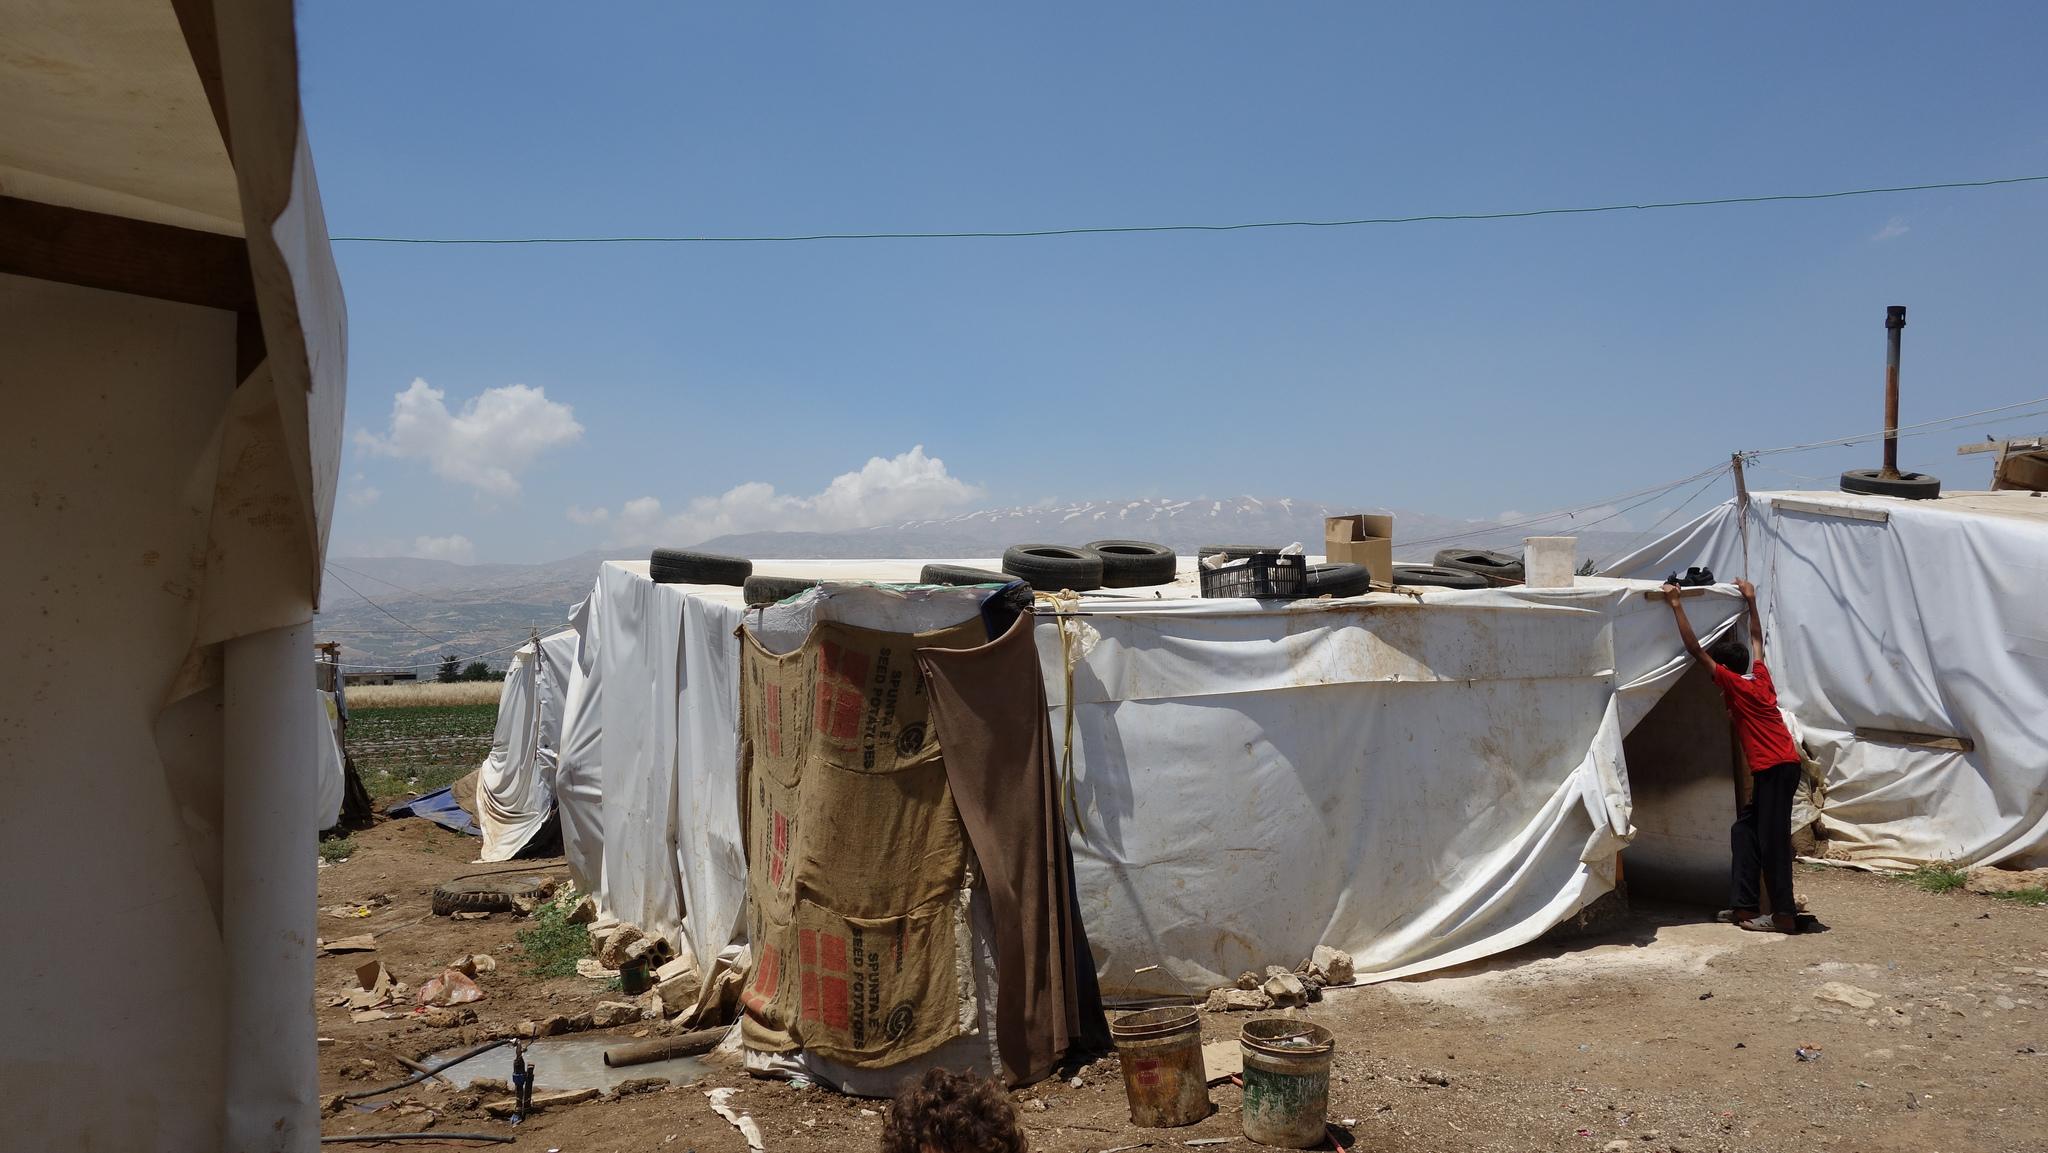 Beirut explosion will impact refugees across Lebanon